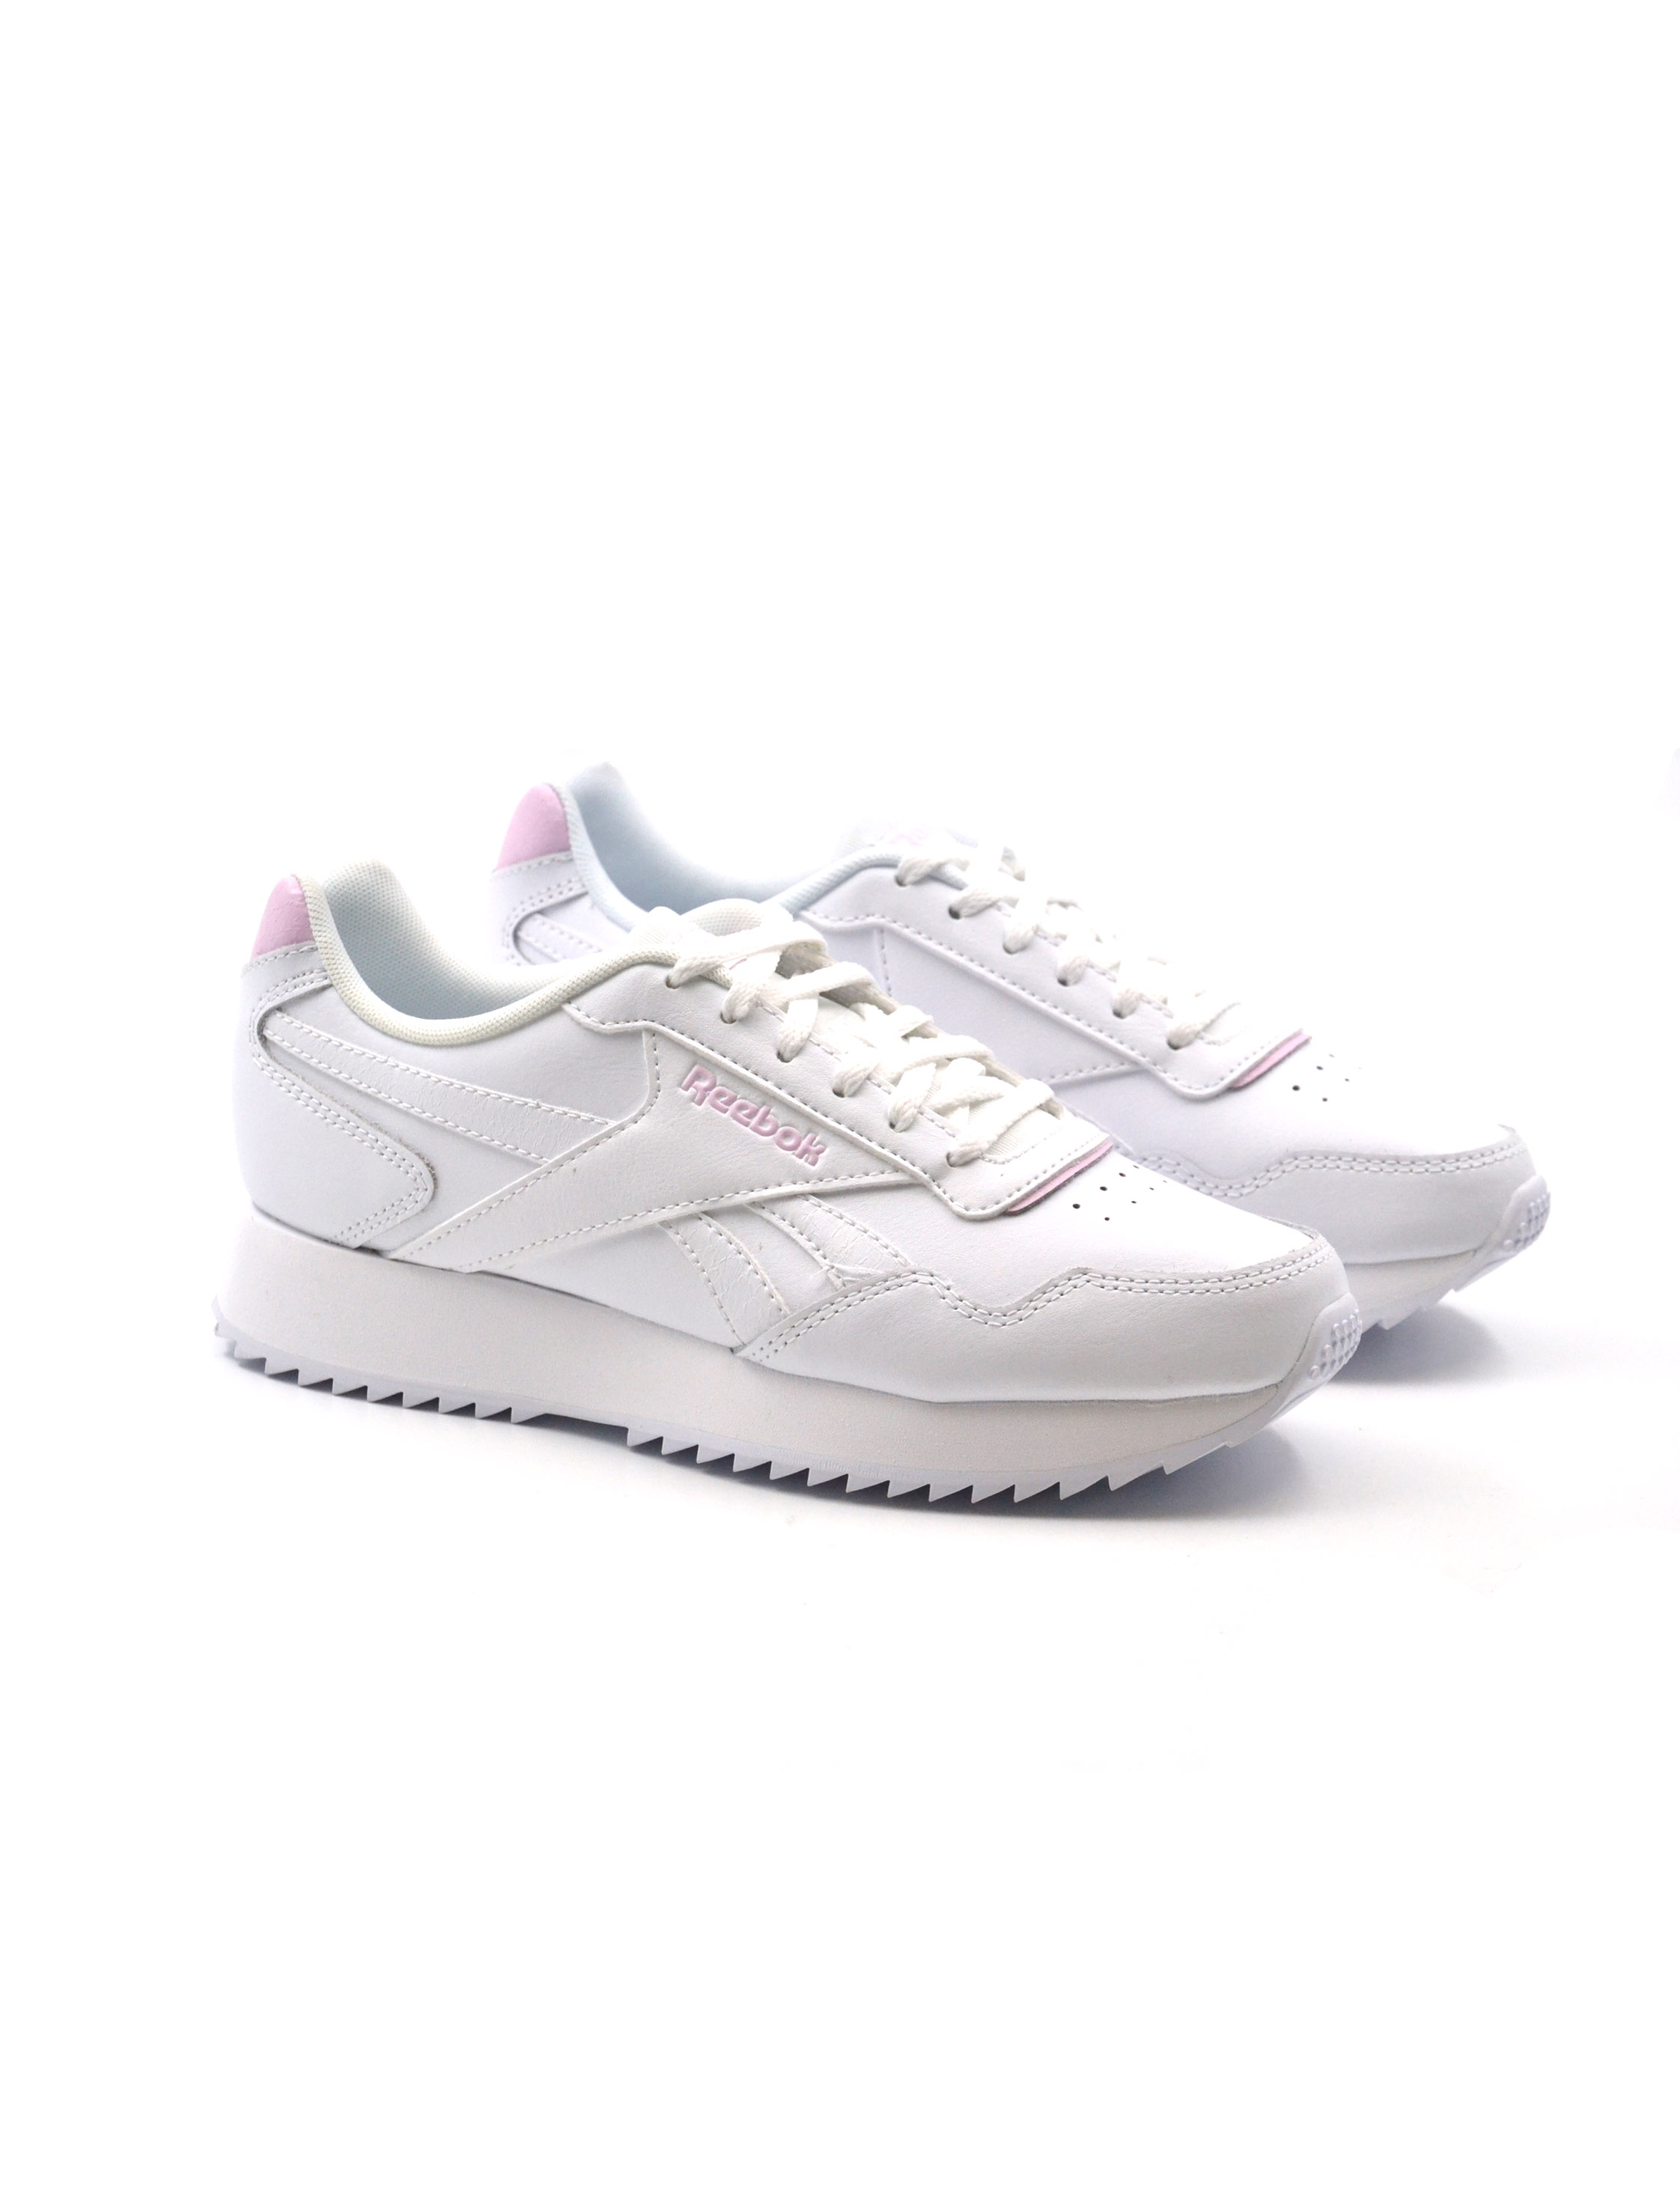 Reebok royal glide sneaker donna, Sneakers brand, colore